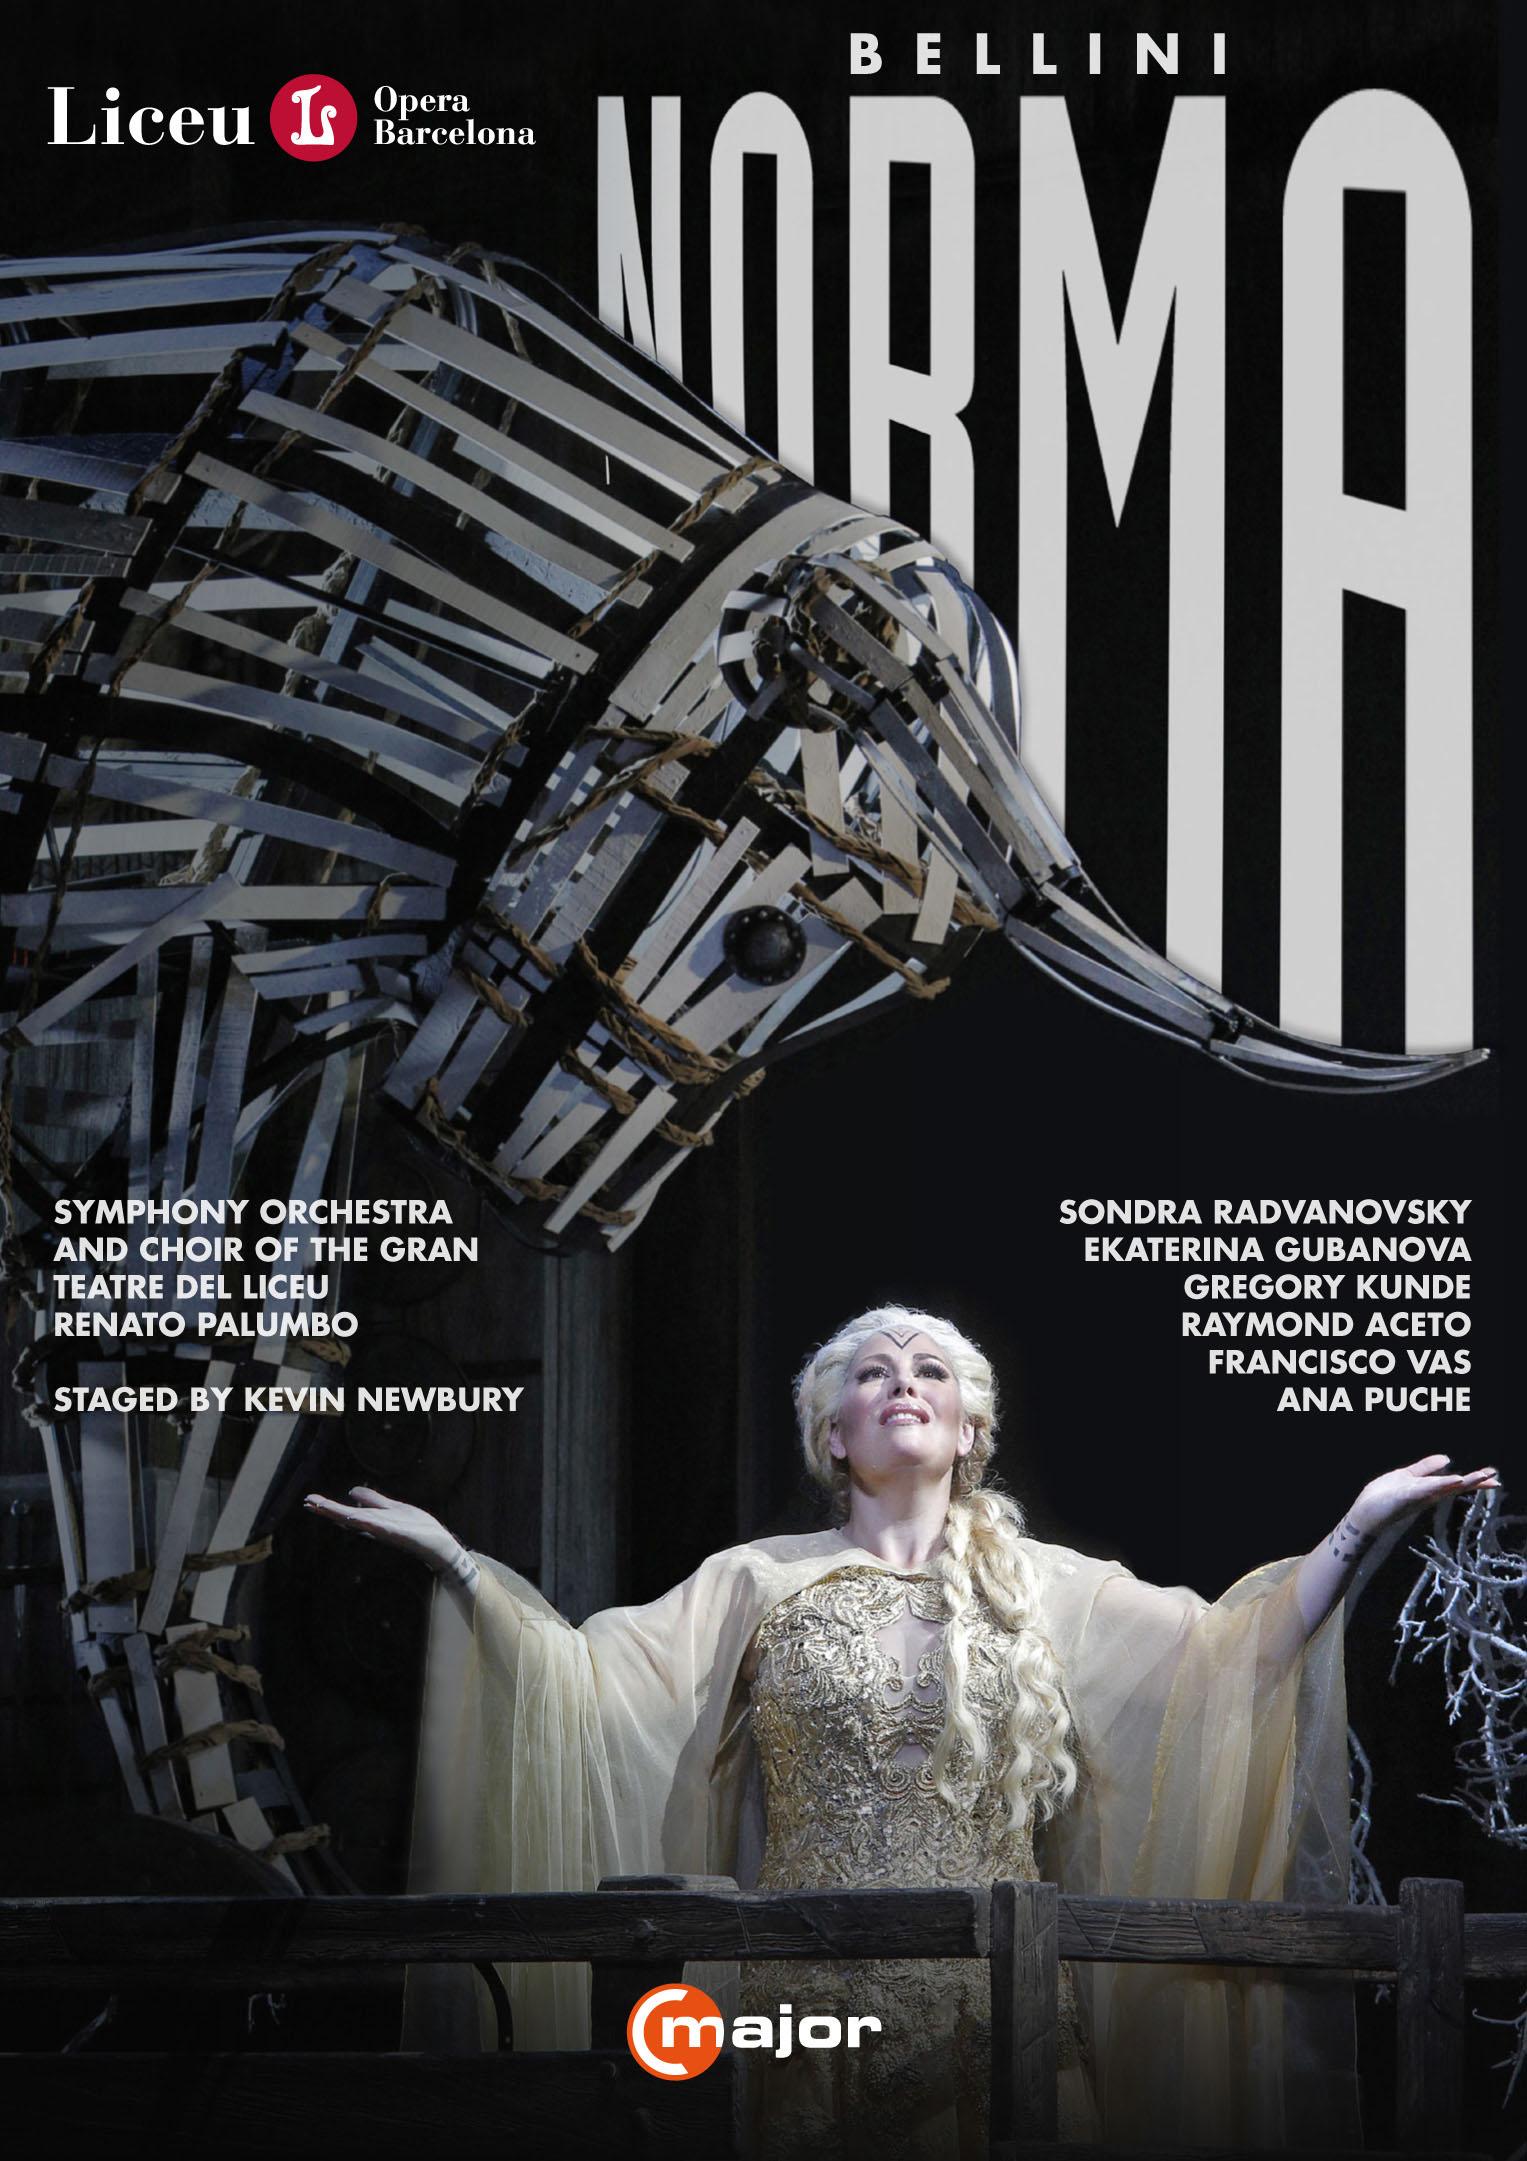 Norma (opera Barcelona) [2 Discs] (dvd) 32175687